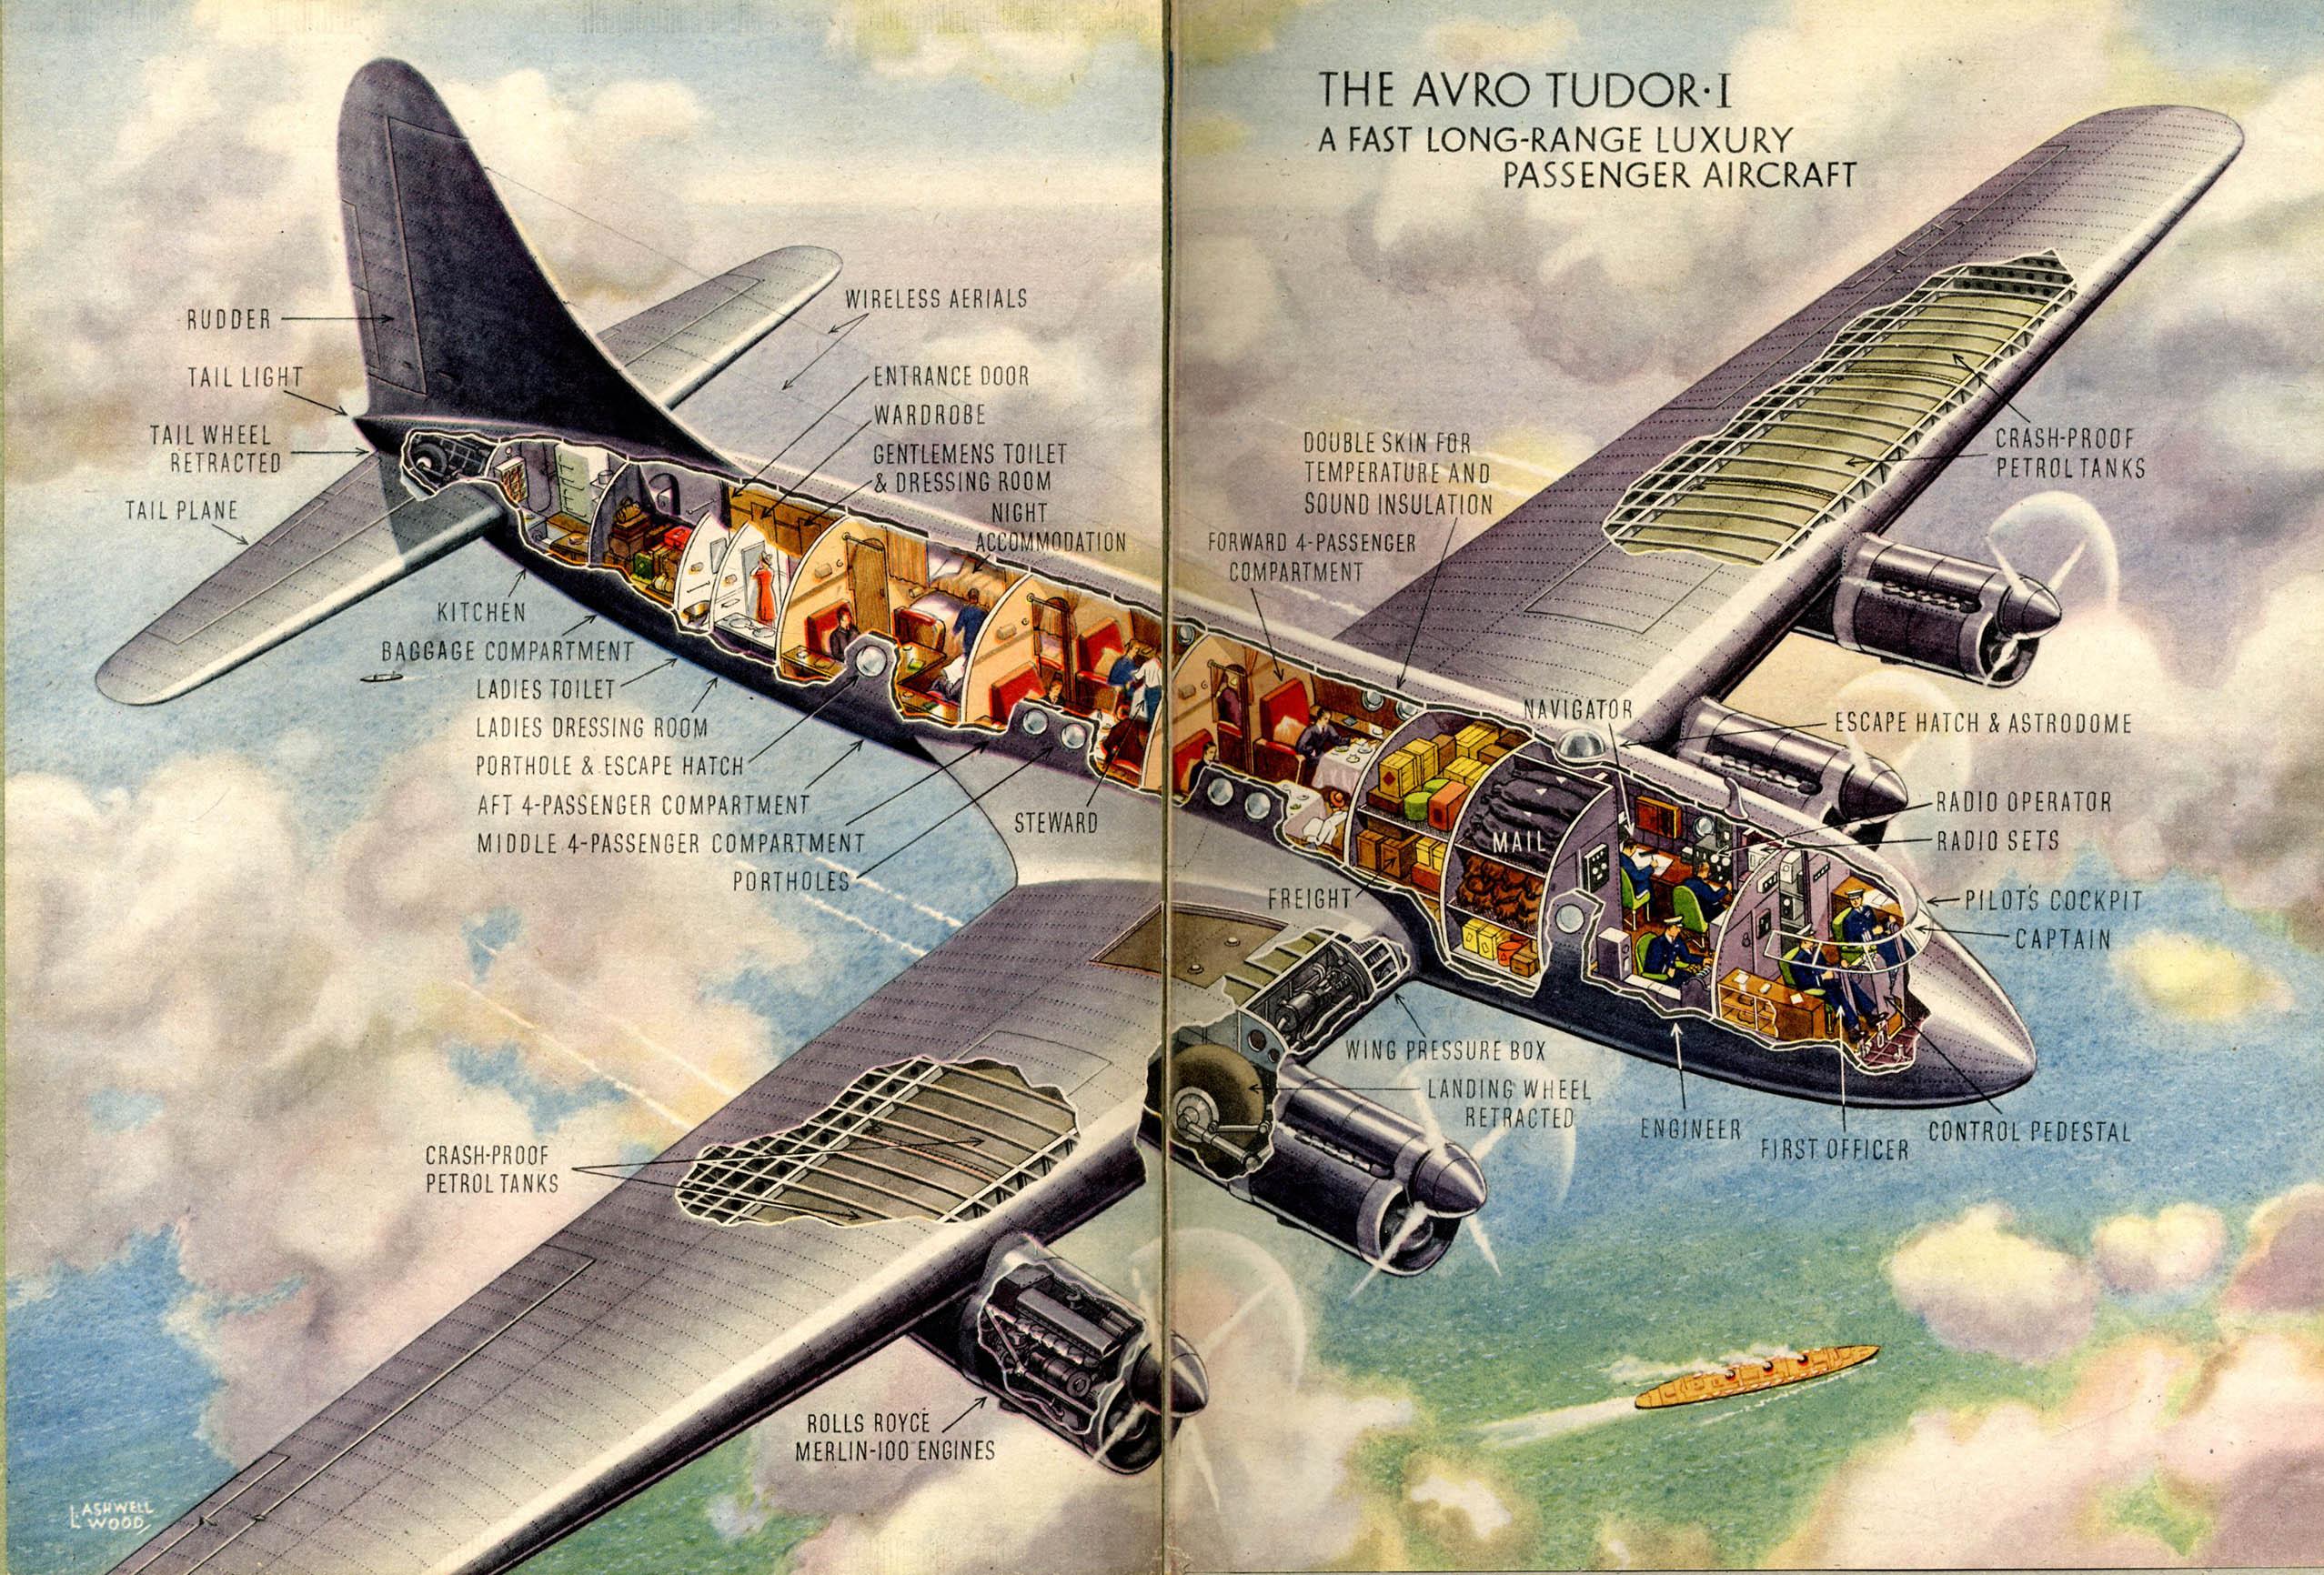 Avro Tudor SH945